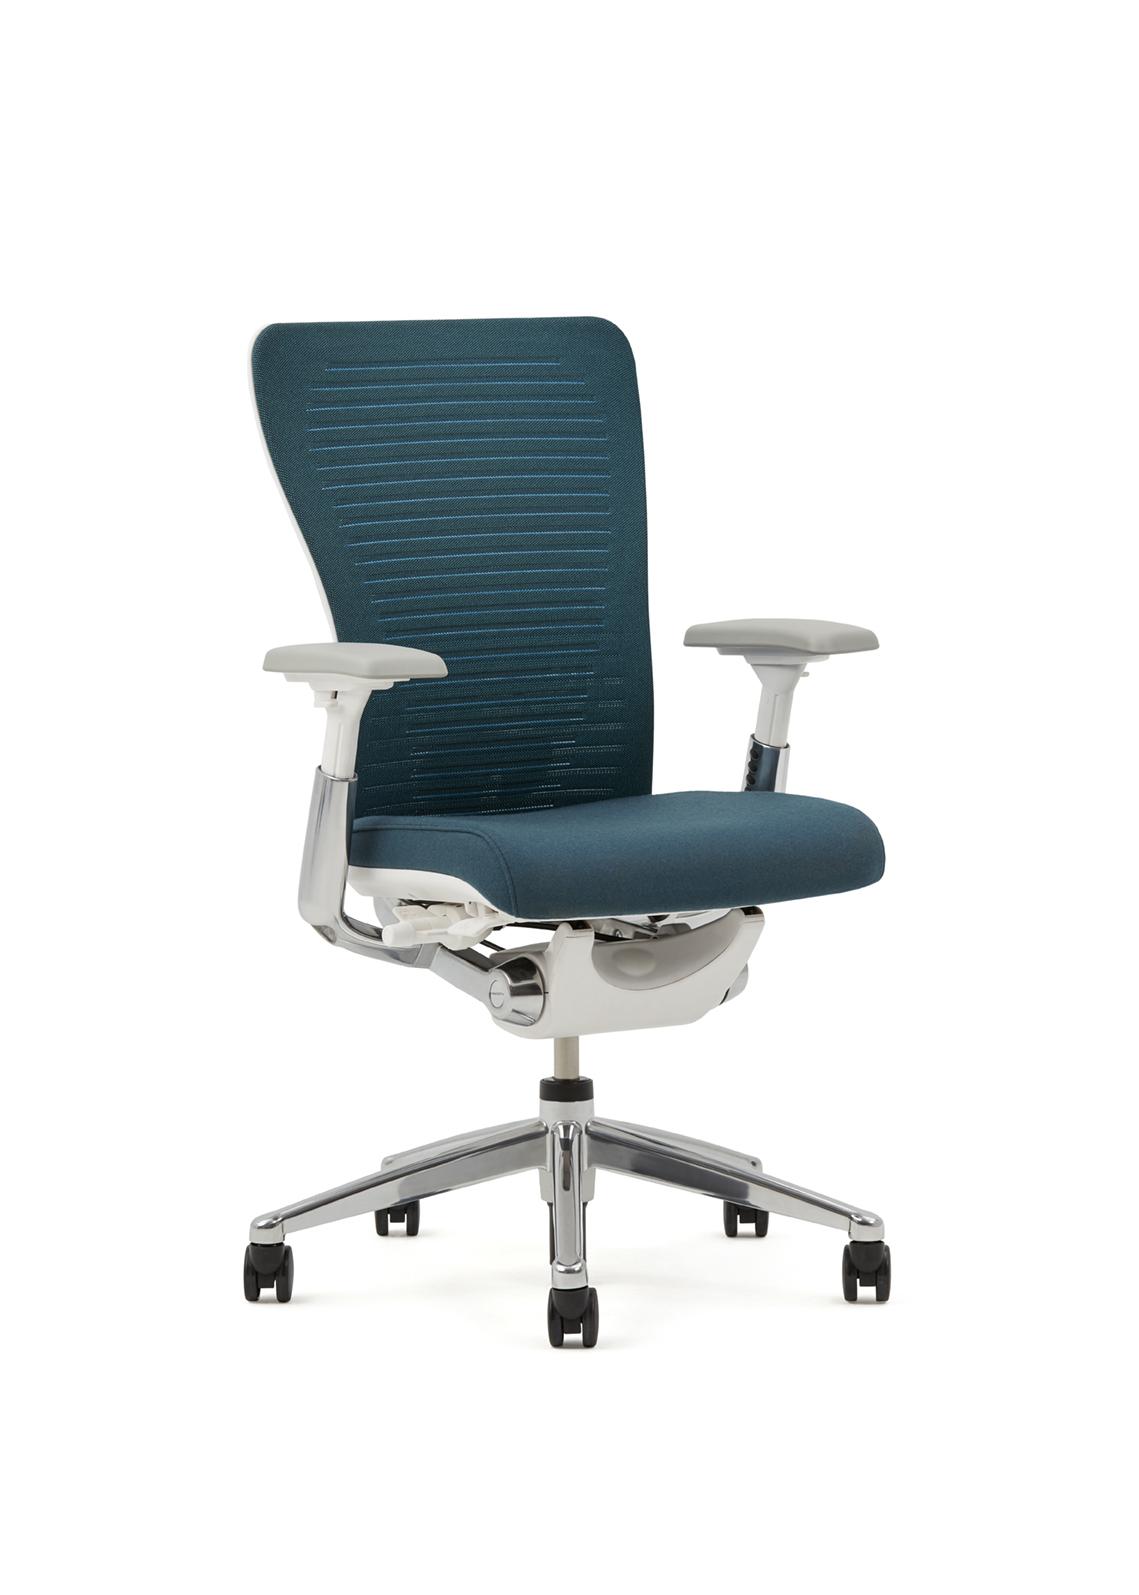 Seating: Haworth Zody